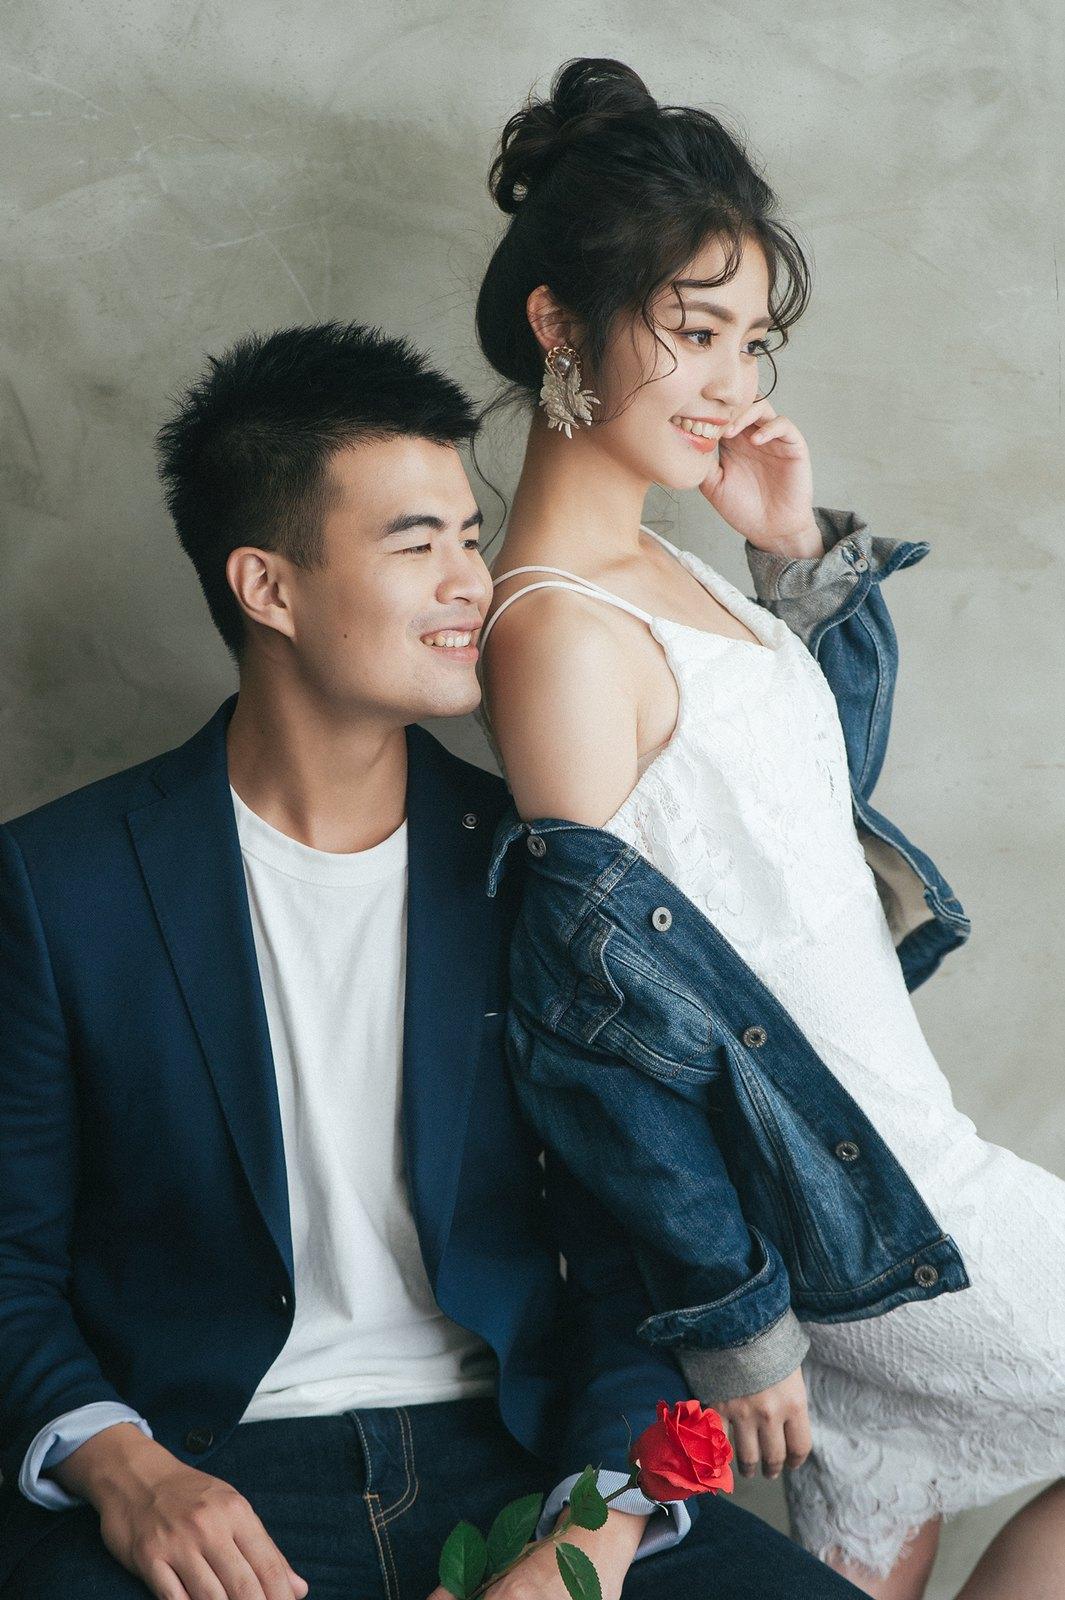 【婚紗】Gary & Jennifer / 婚紗意象 / EASTERN WEDDING Studio